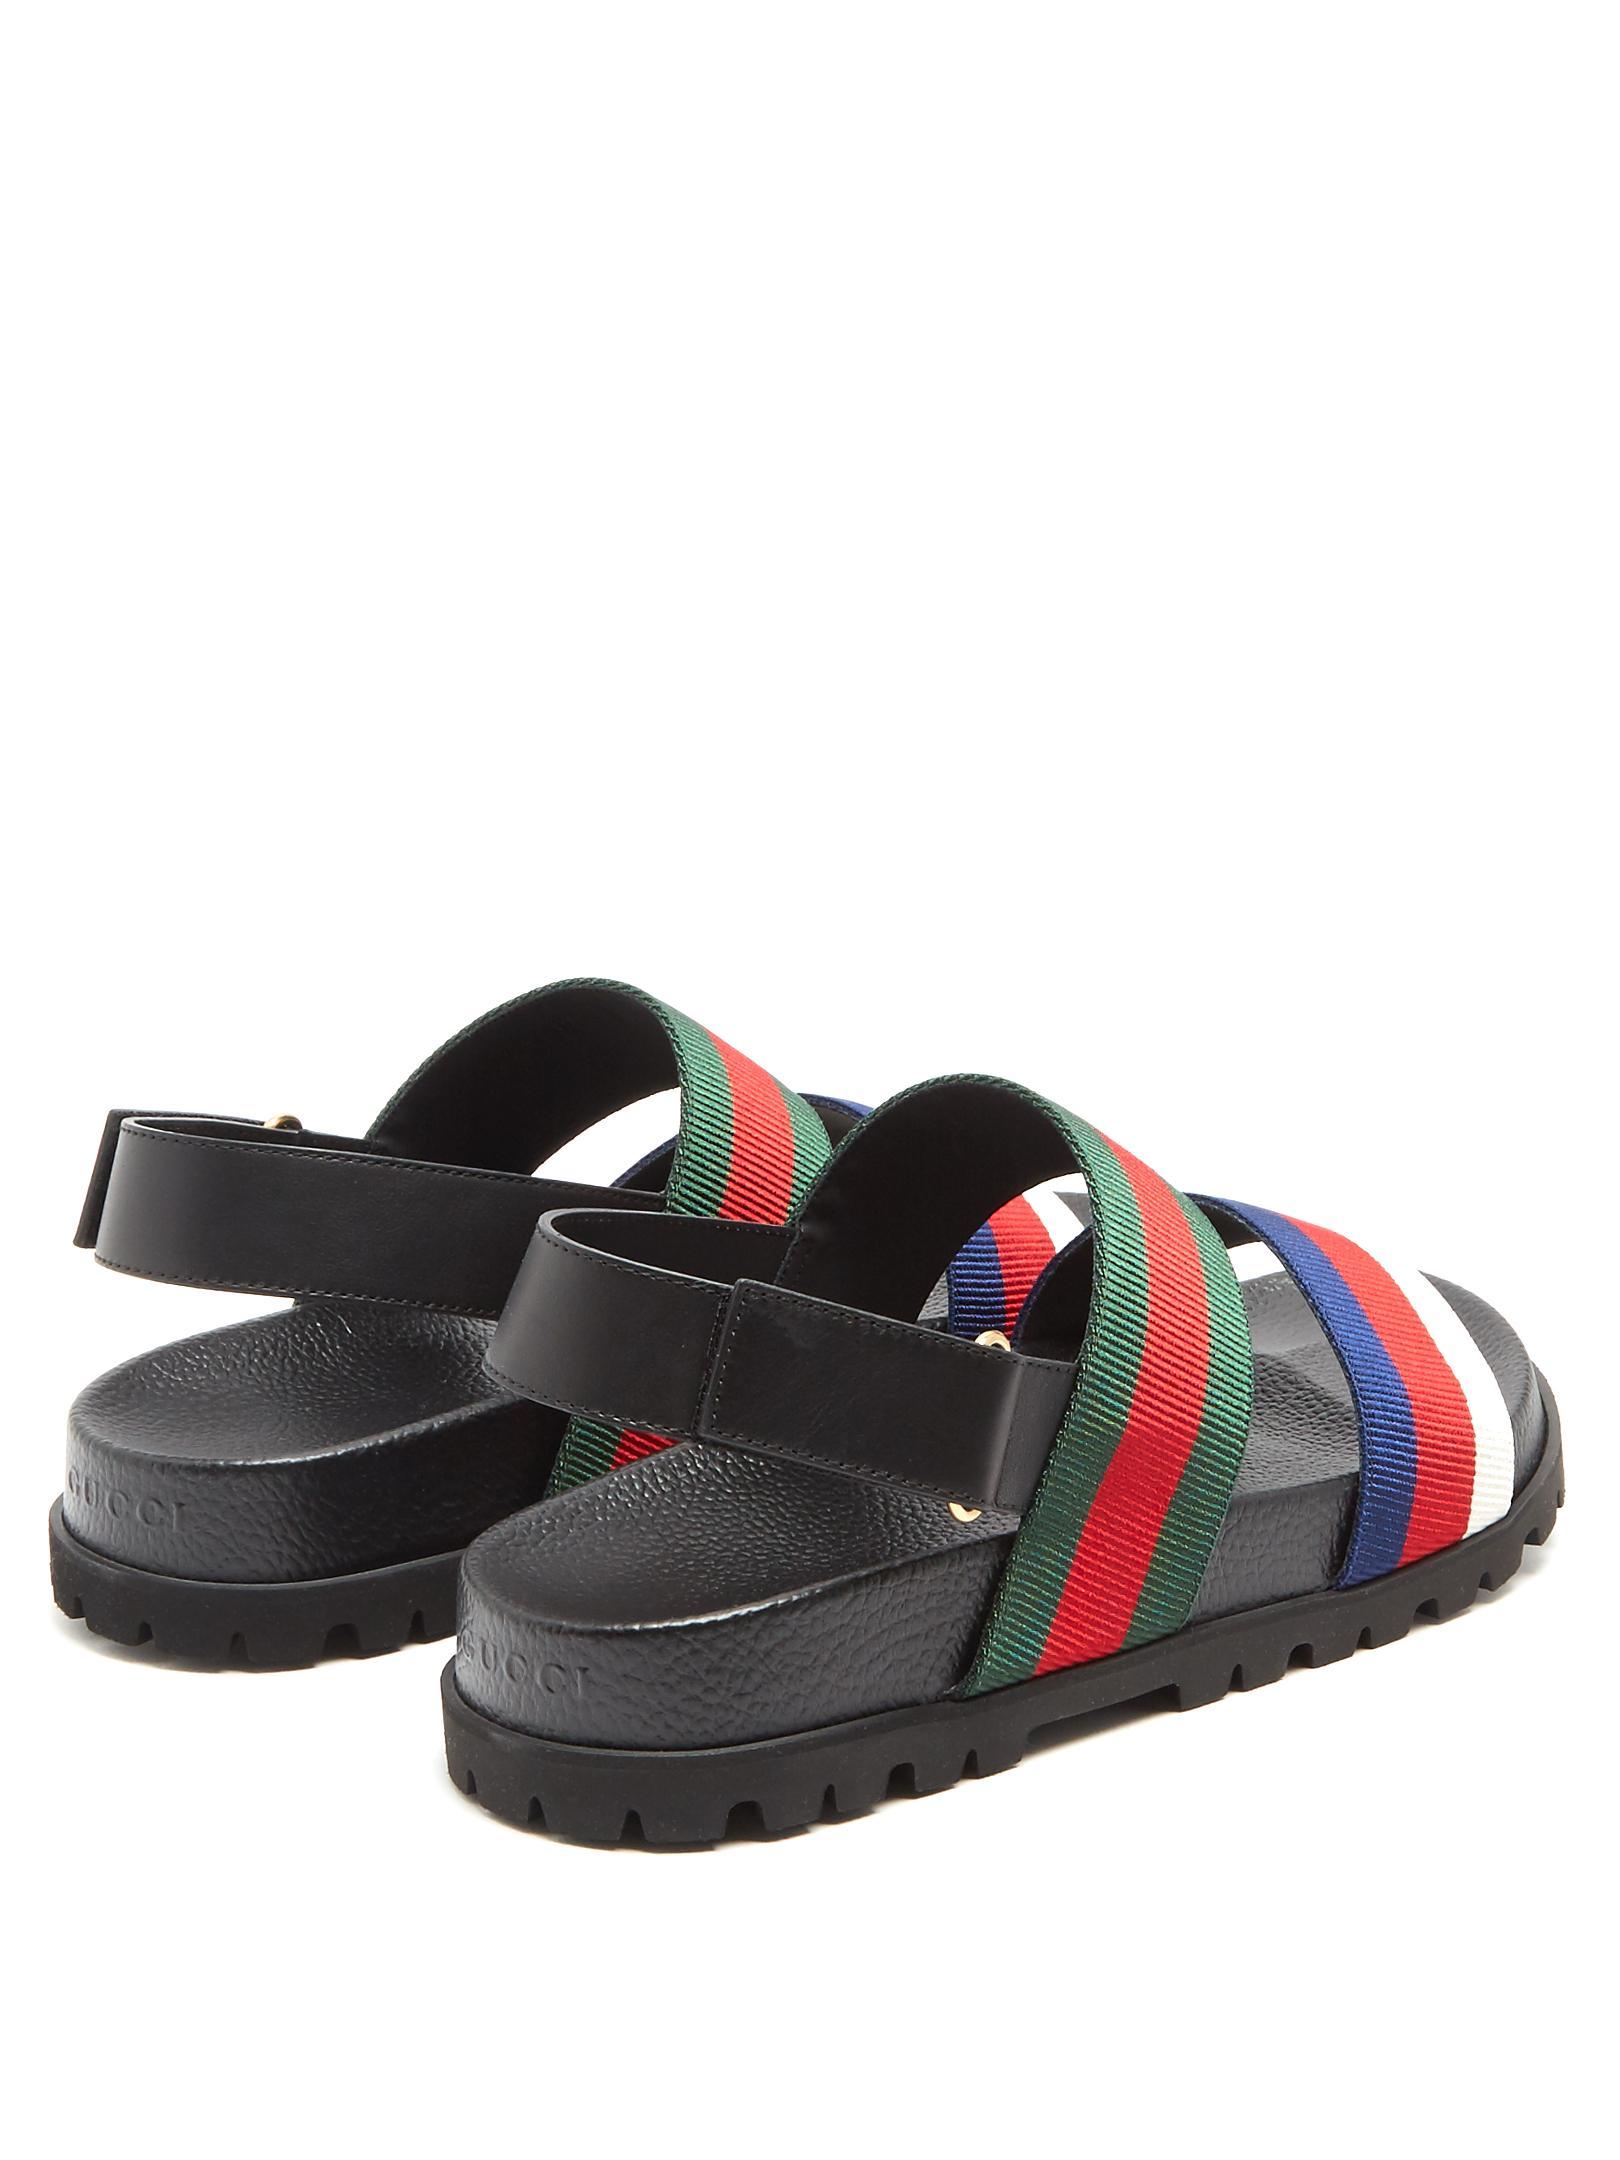 b6c6cf2c51dc84 Gucci Rimini Striped Sandals for Men - Lyst